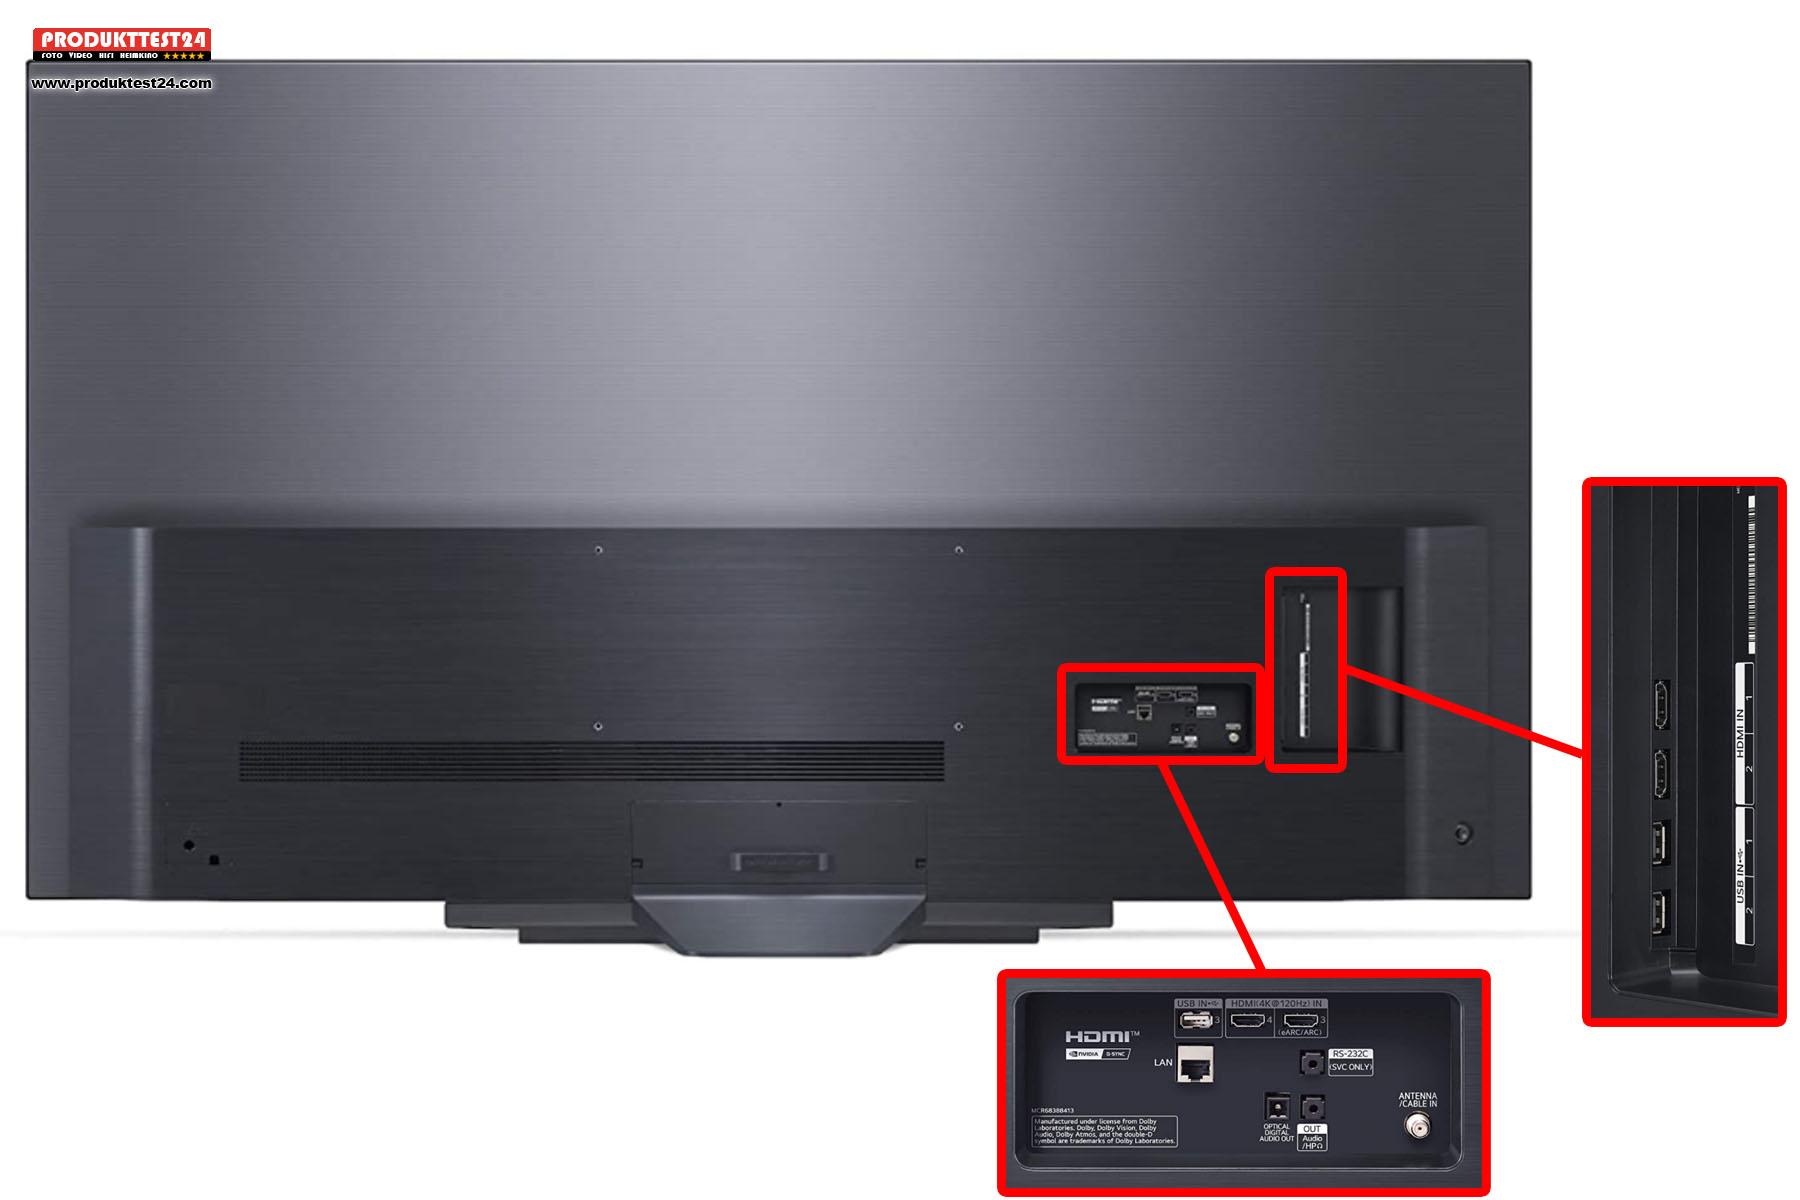 Vergrößerung des Anschlusspanels des LG OLED55B19LA